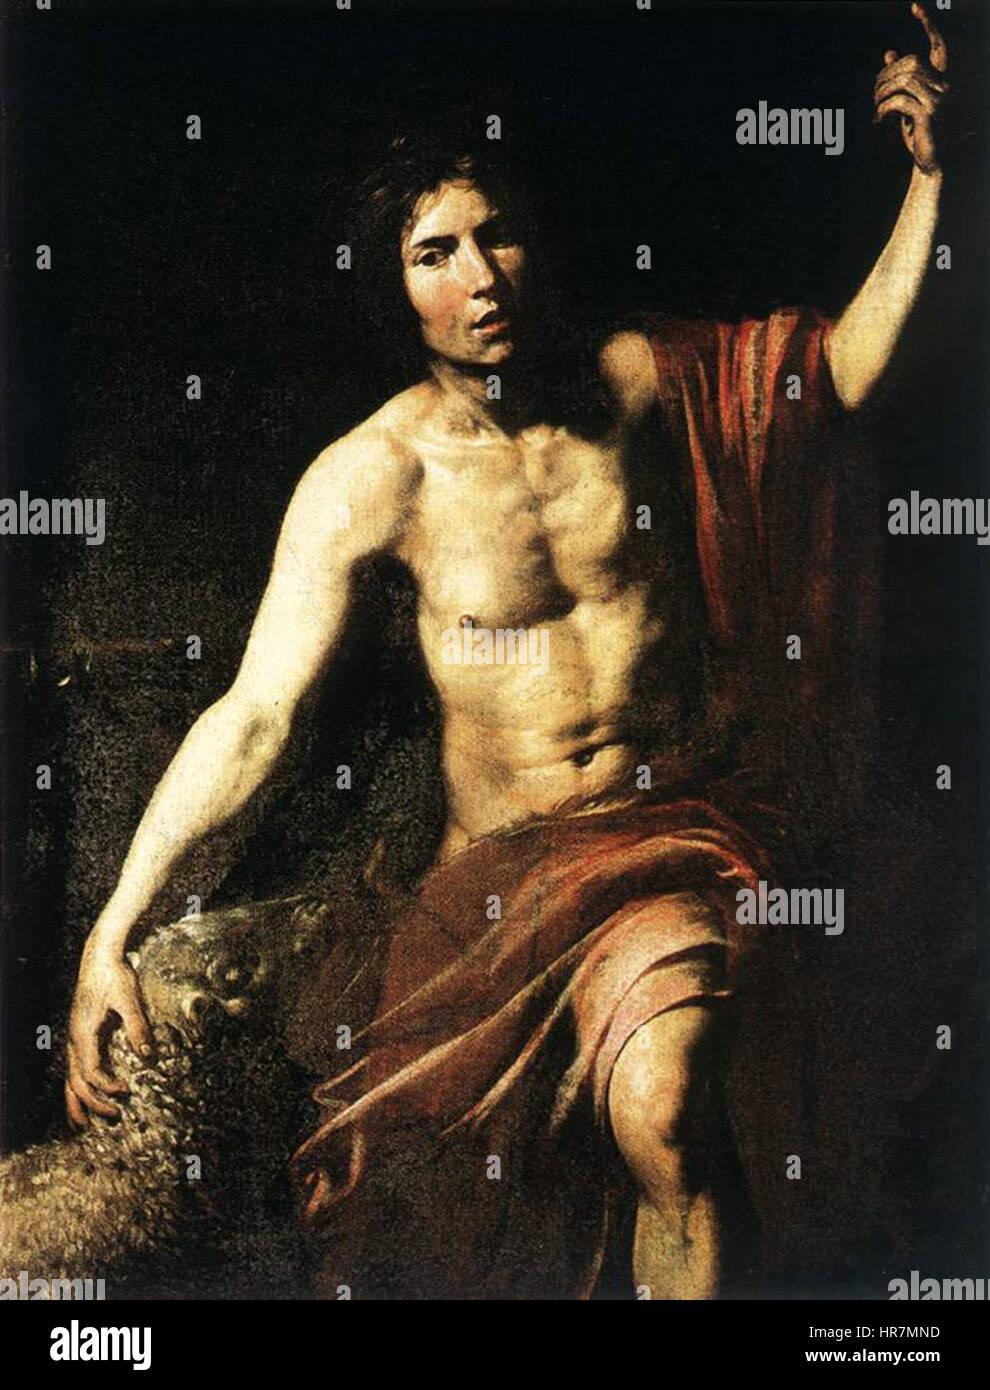 Valentin de Boulogne, St John the Baptist - Stock Image